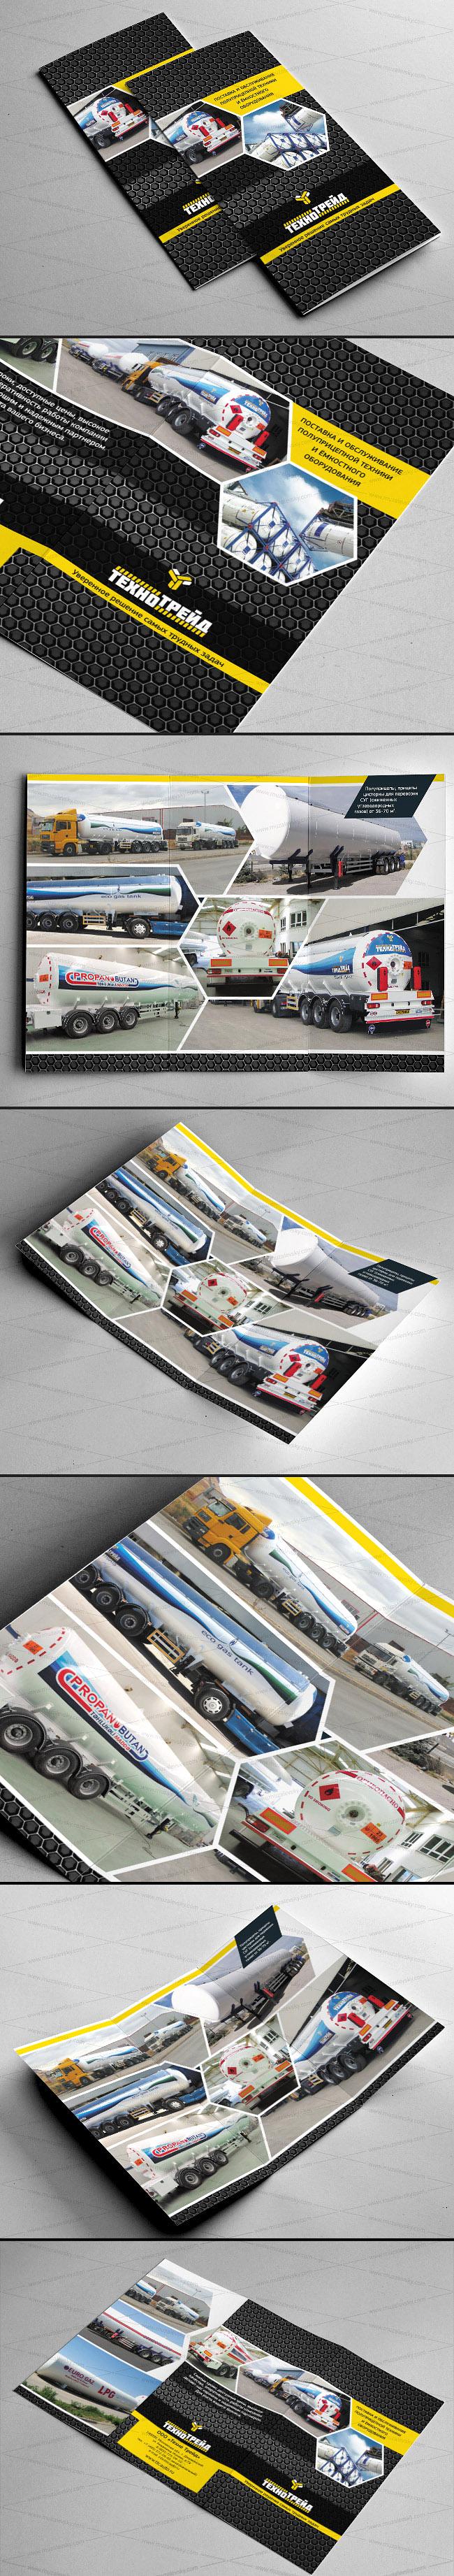 Booklet-TechnoTrade